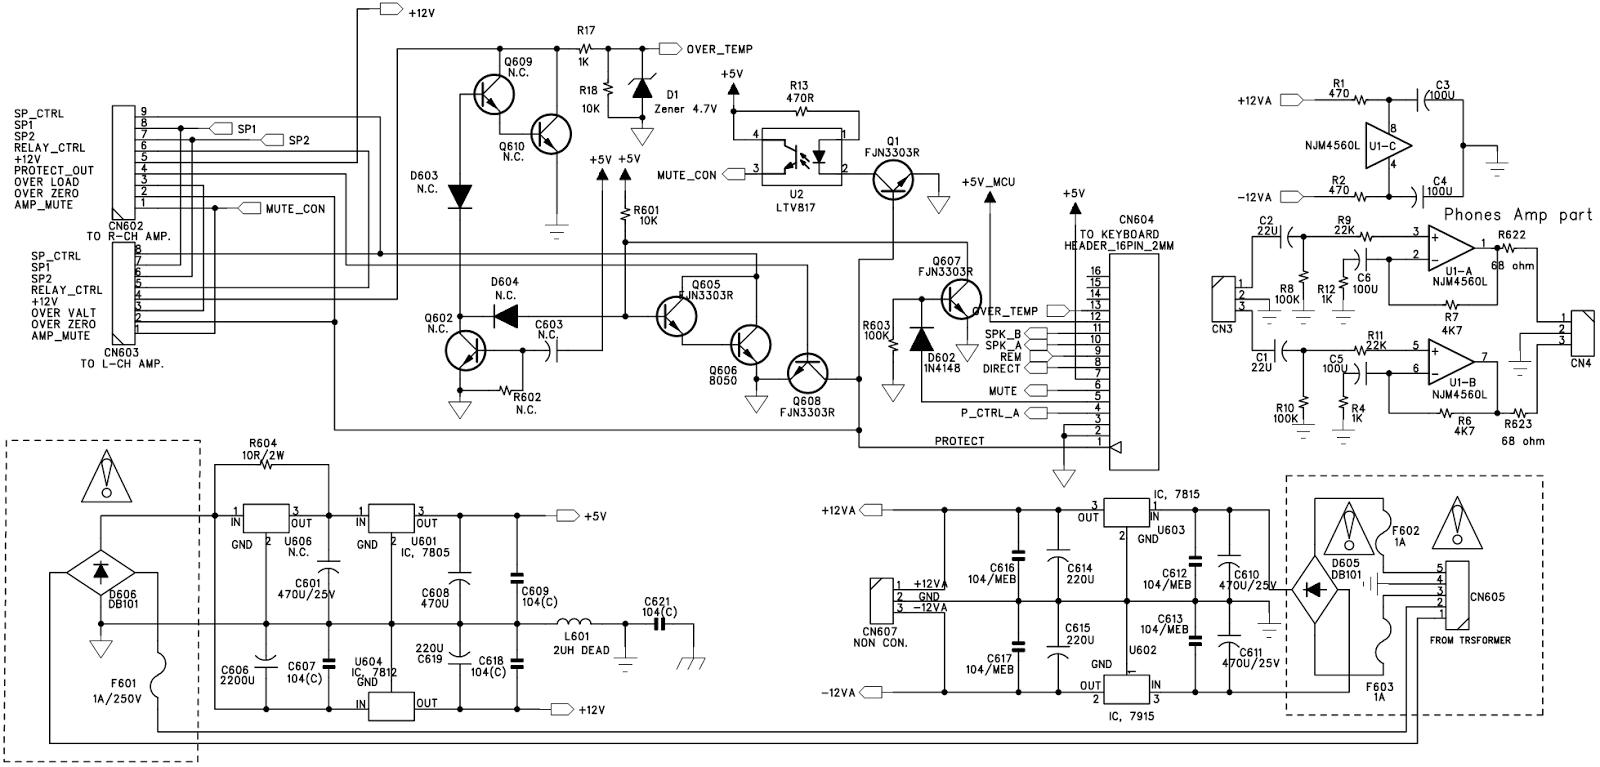 auto electrical wiring diagram lifan car equalizer